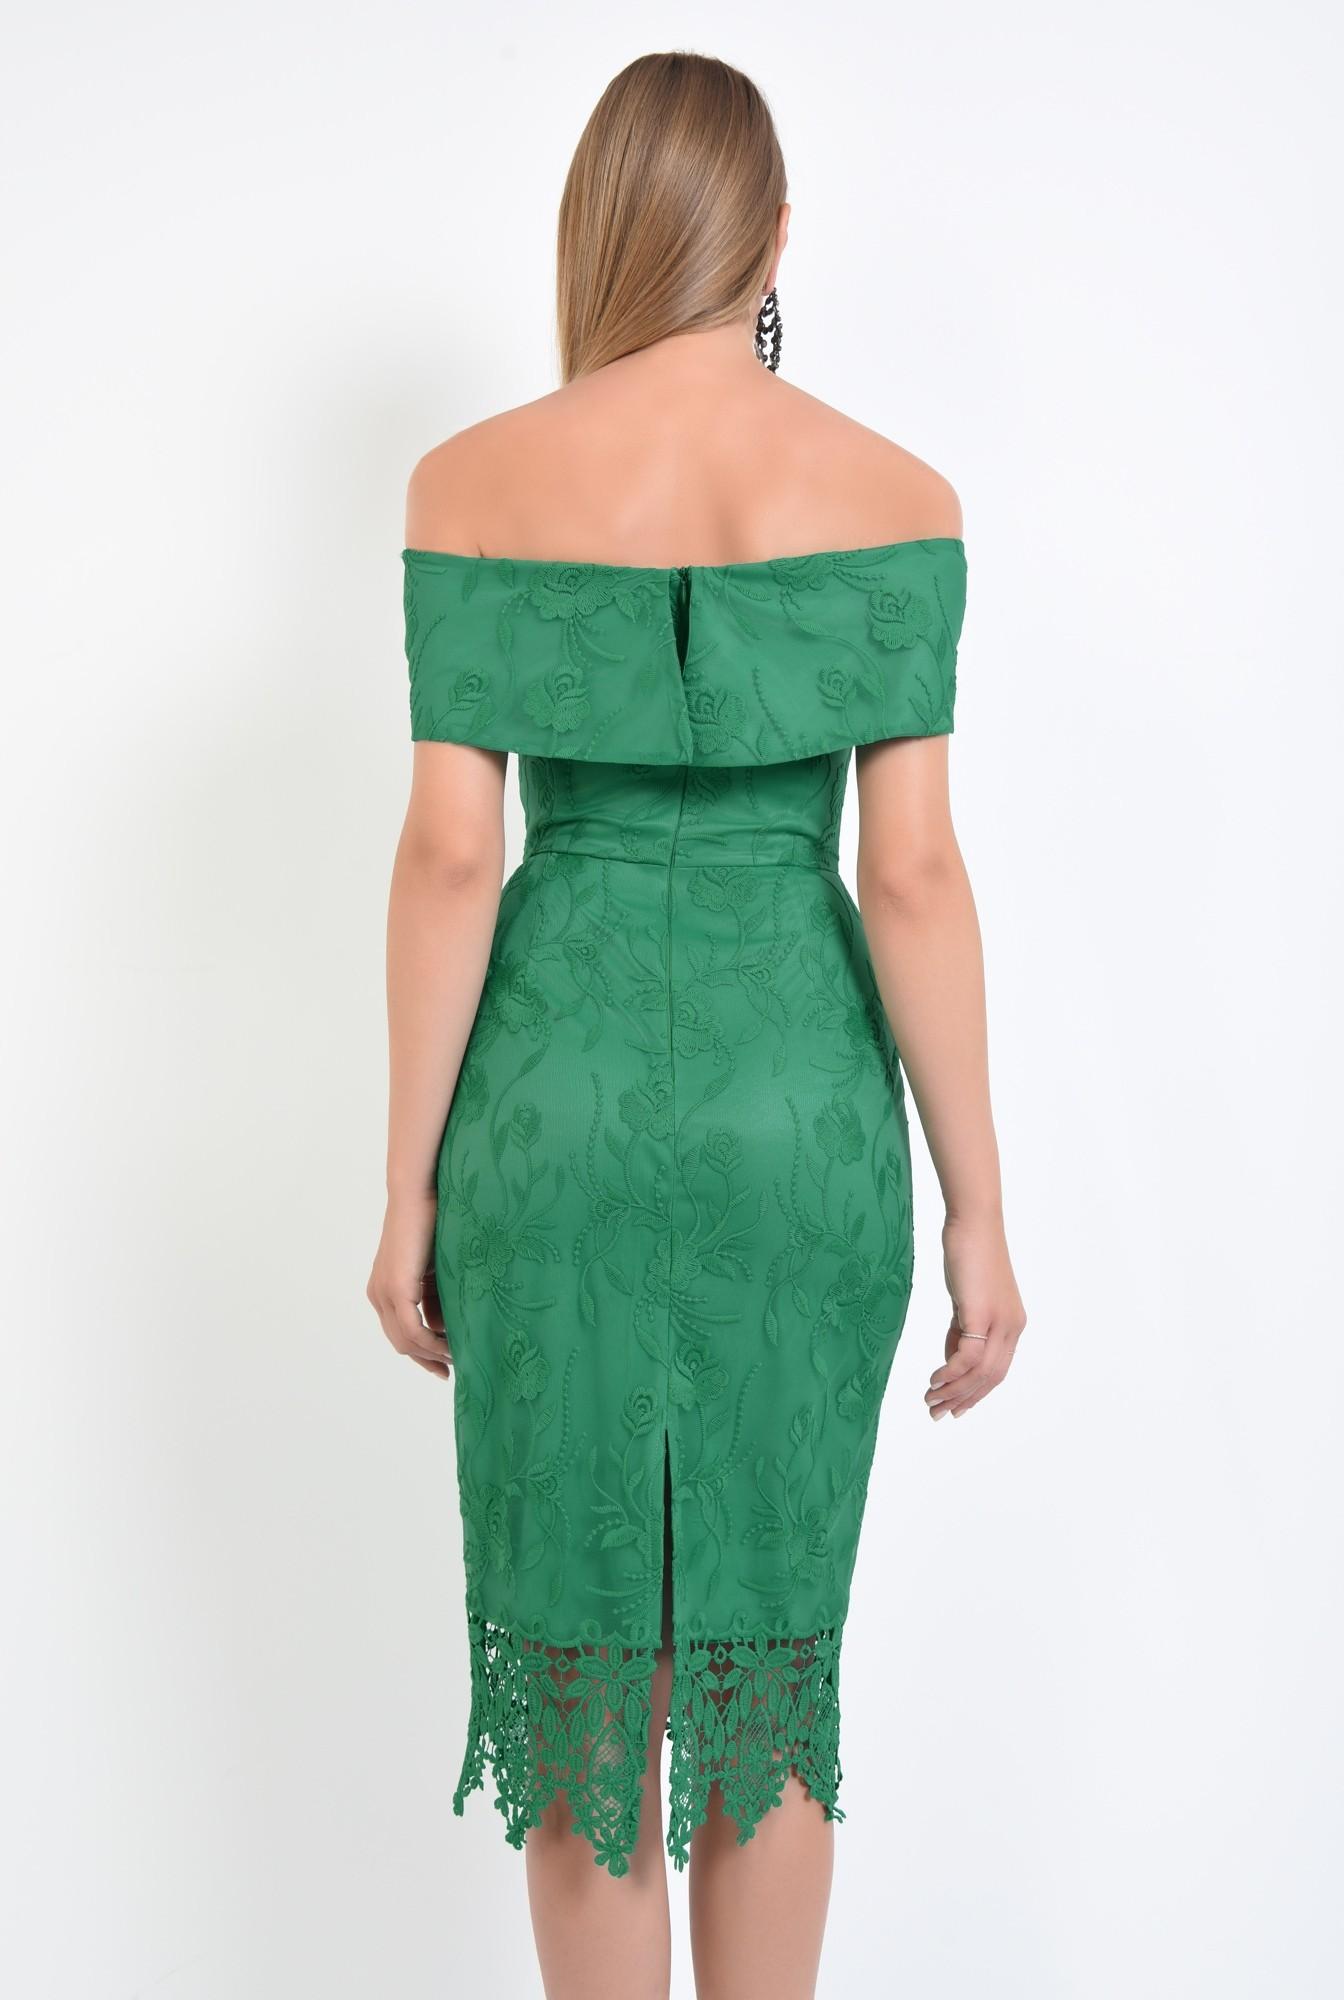 1 - rochie eleganta, conica, dantela, verde, umeri goi, rochii online